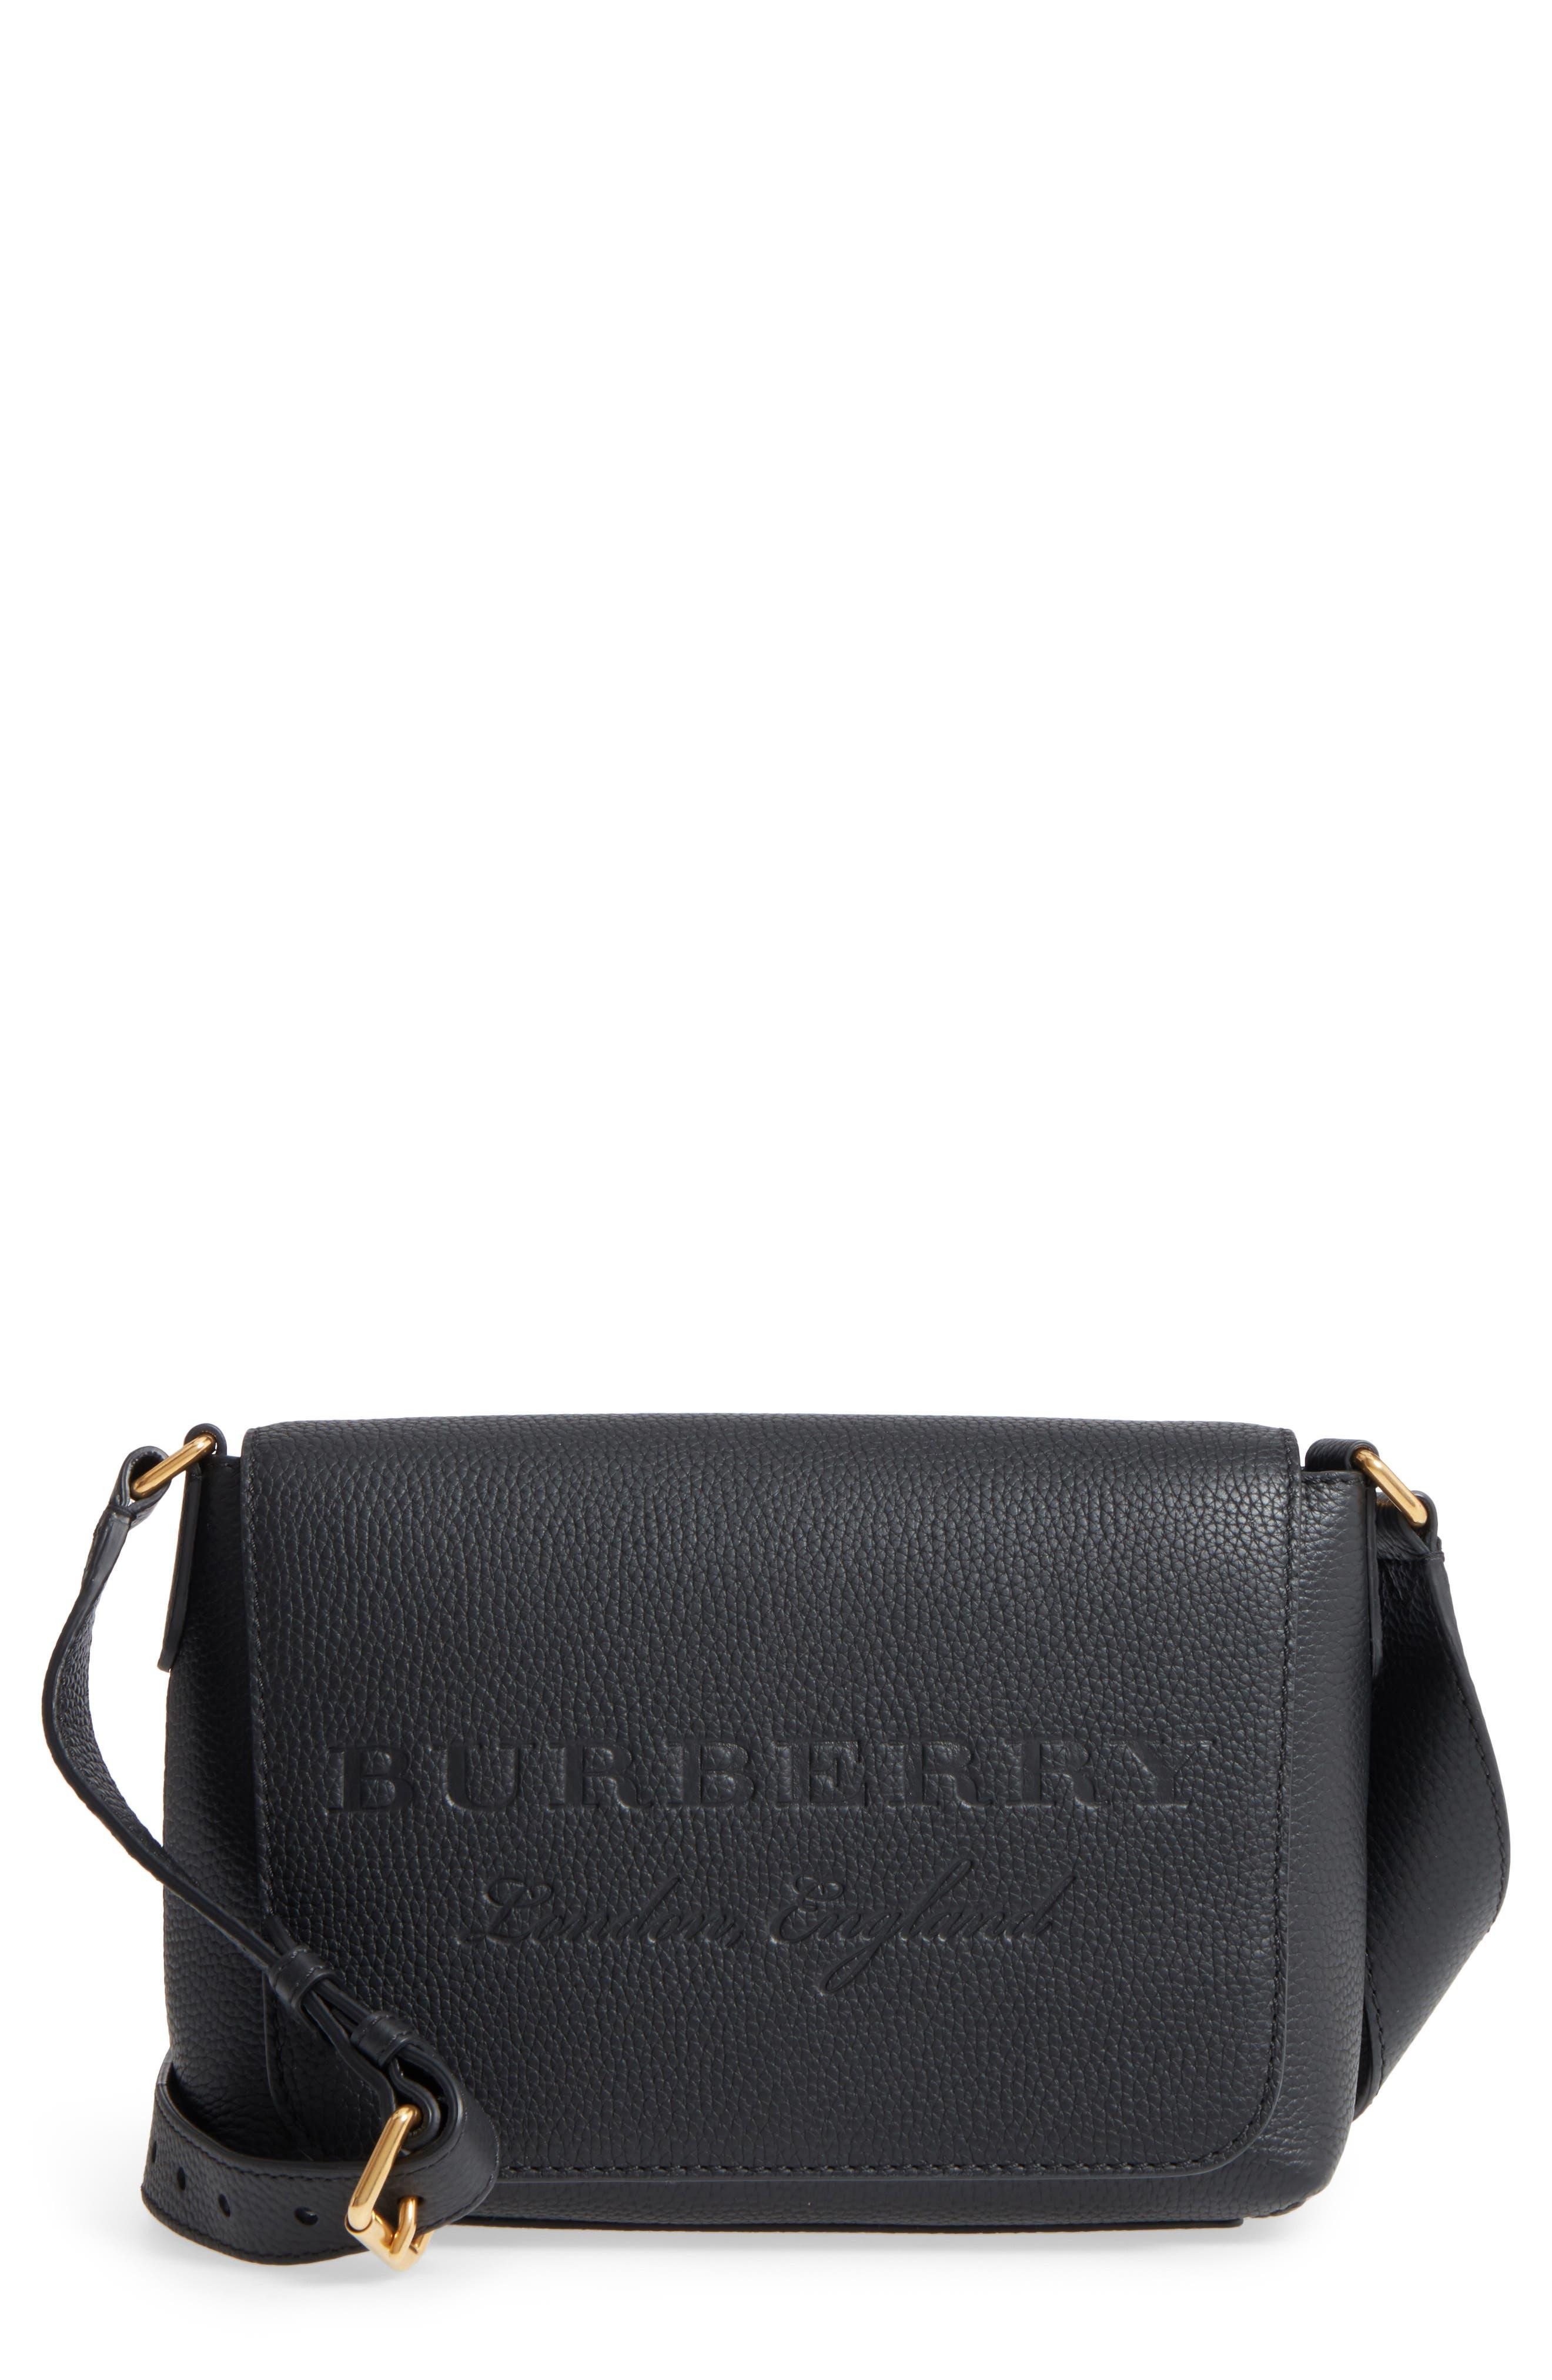 Alternate Image 1 Selected - Burberry Small Burleigh Leather Crossbody Bag